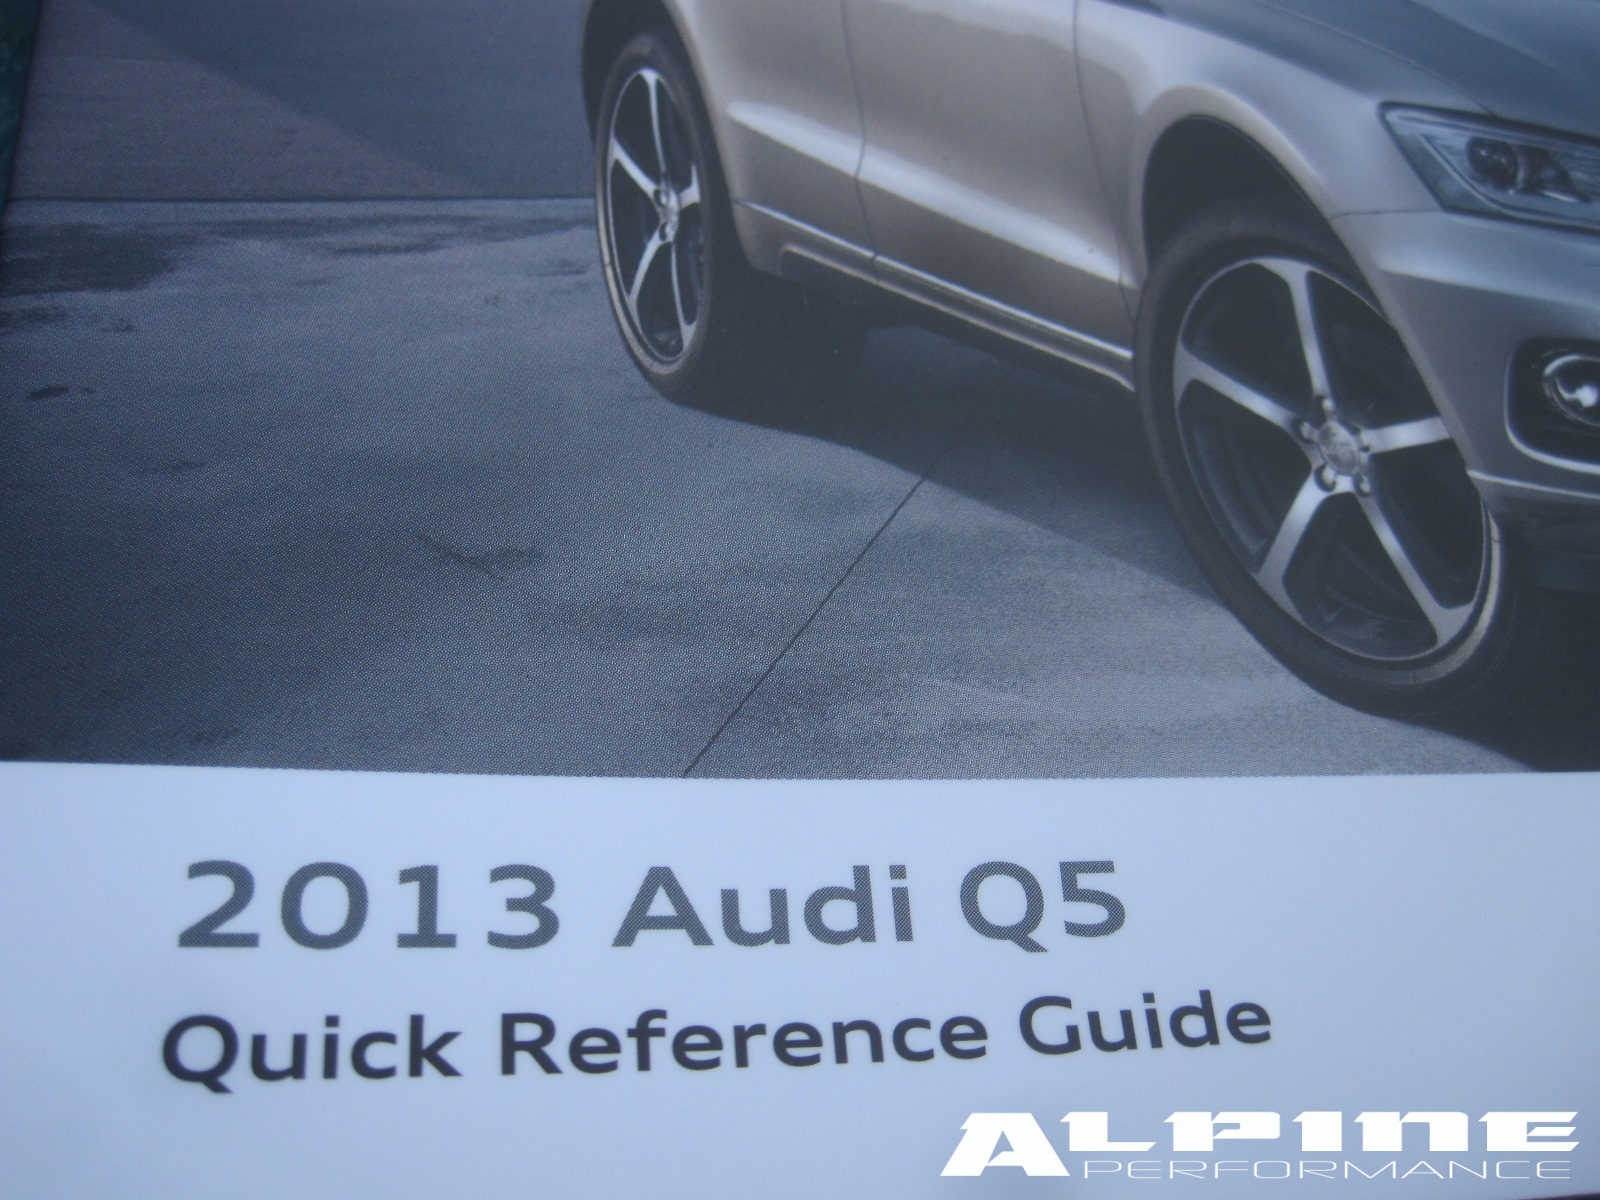 Audi Q5 user manual Pdf